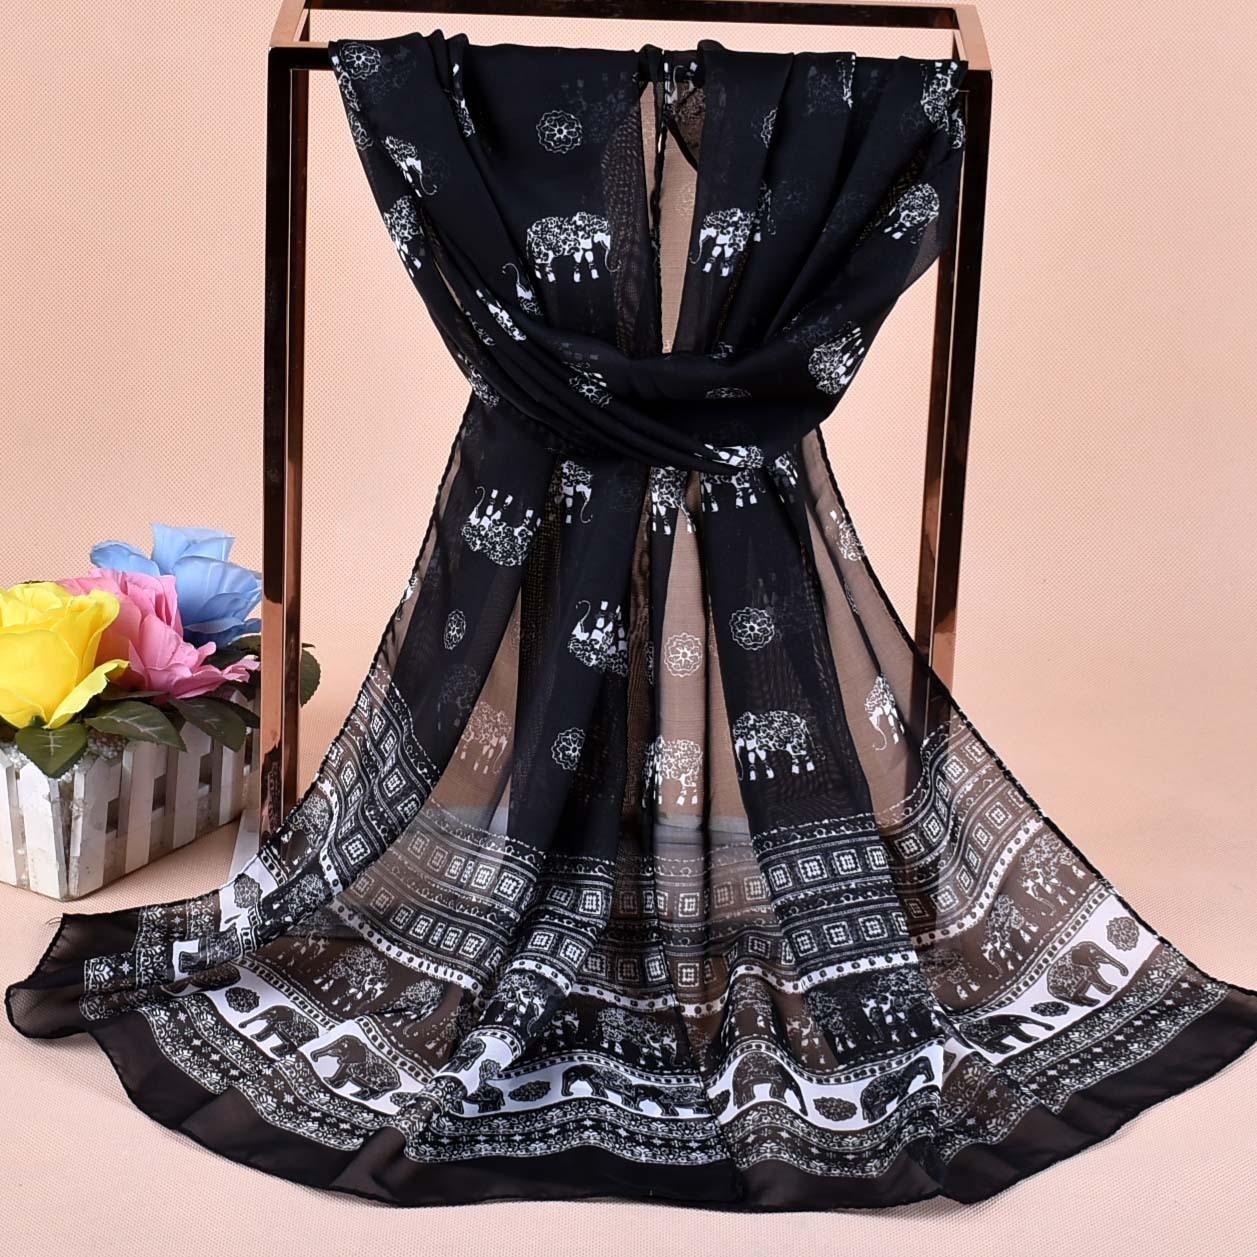 Scarf   chiffon shawl women   scarves     scarf   designer brand luxury headscarf swraps printing hijab ethnic kerchief bandana sjaal wape